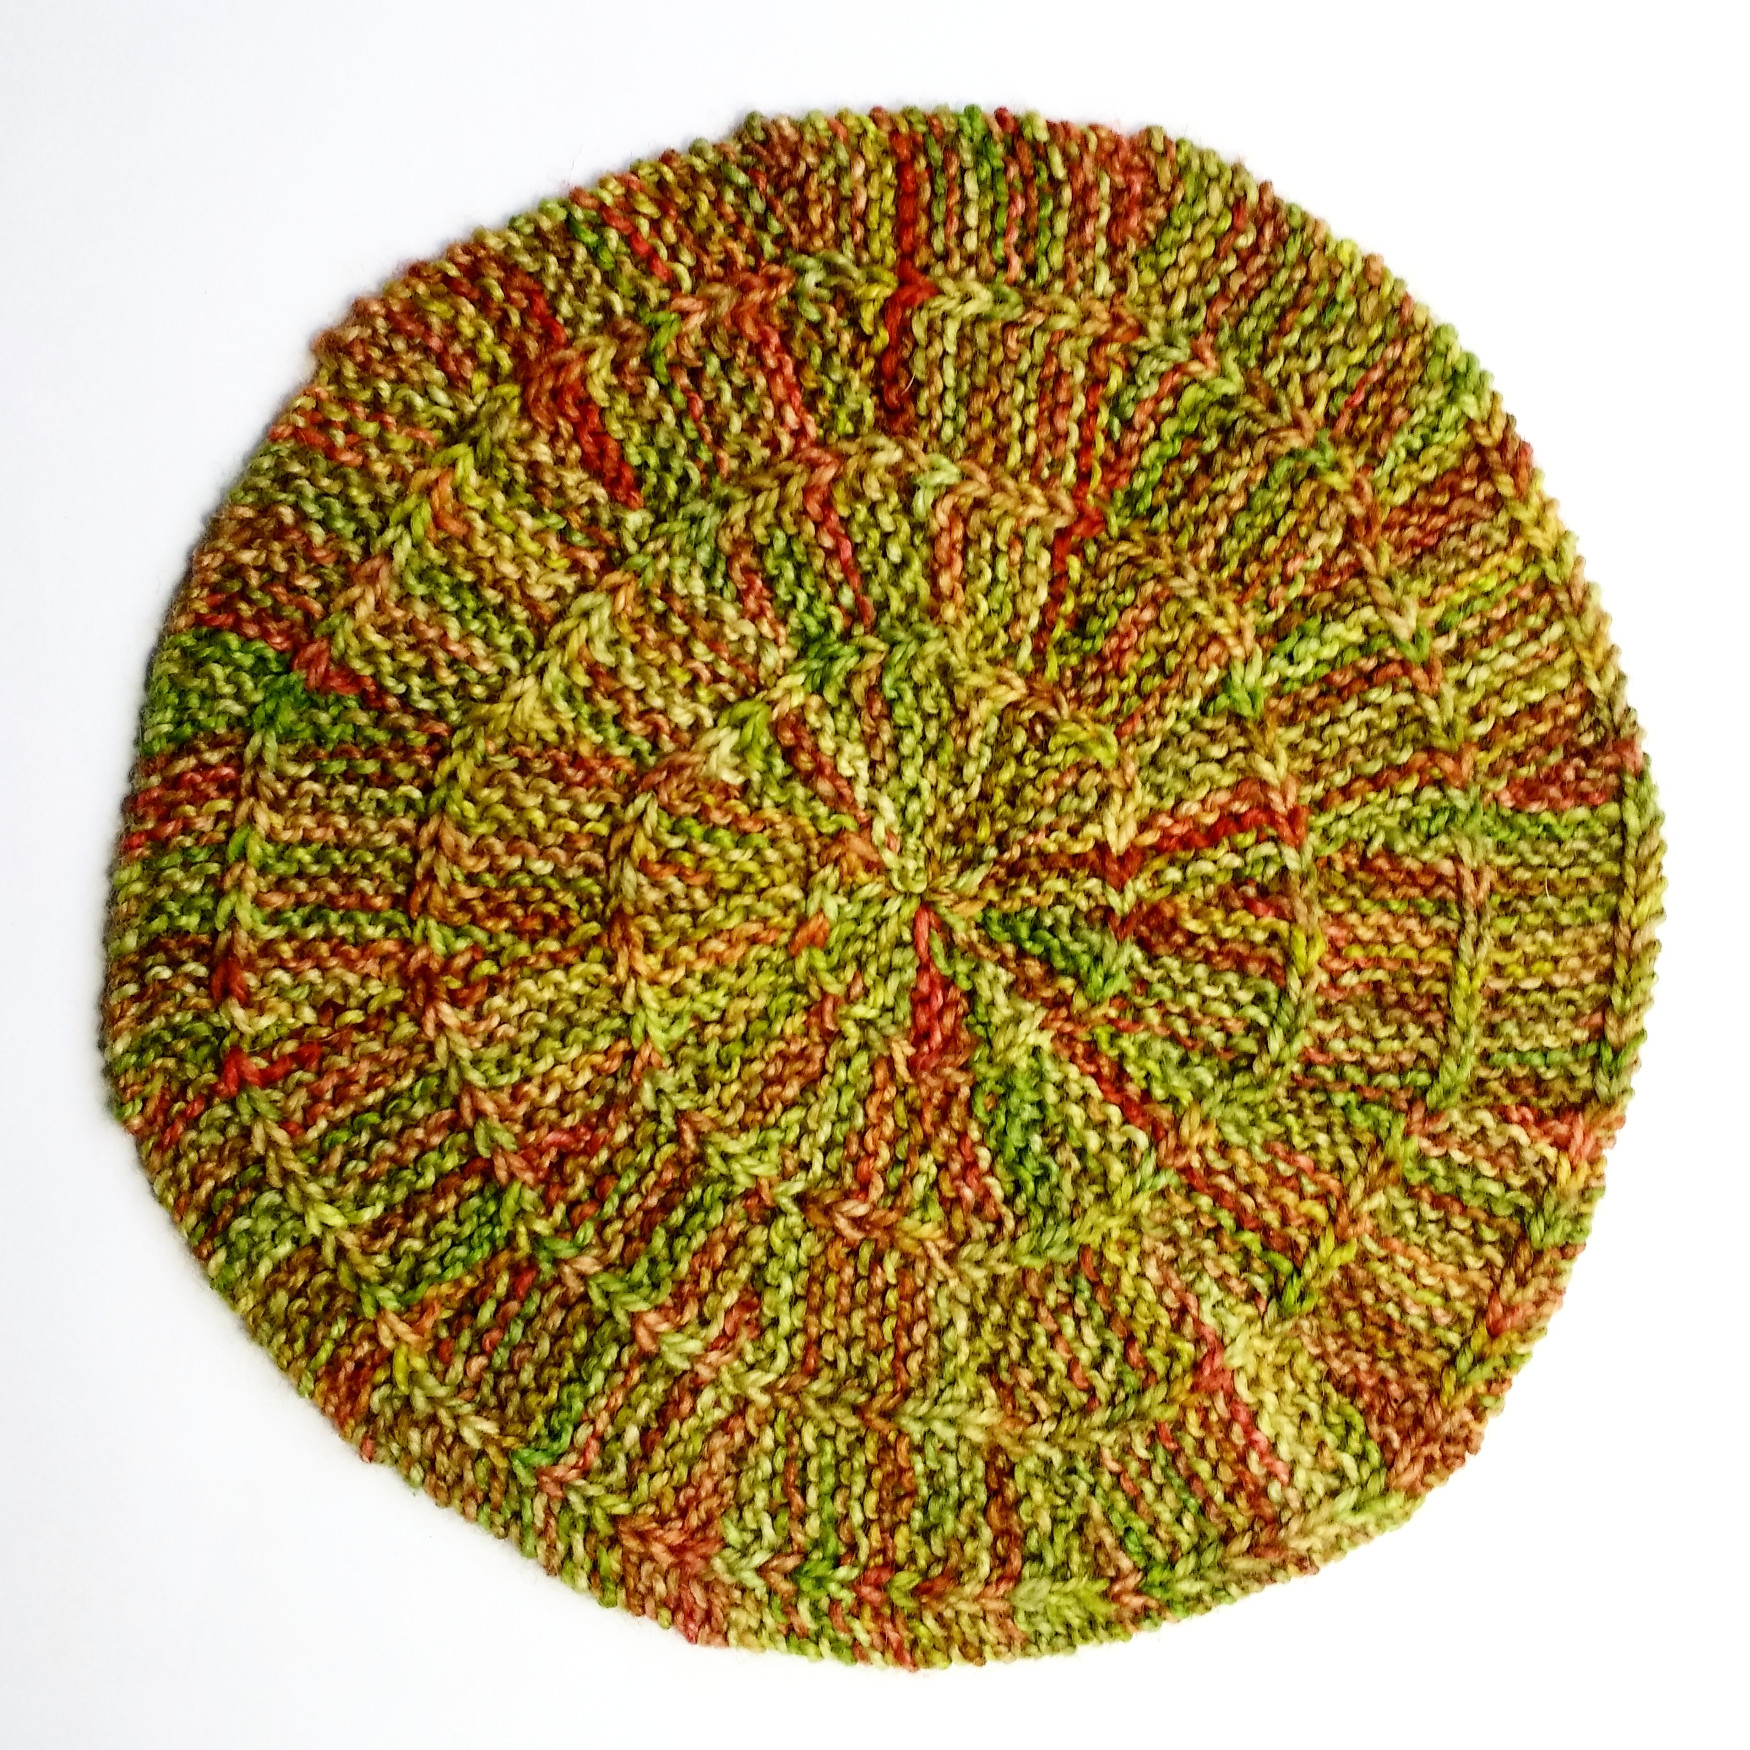 grafted slipped stitch spiral swatch!